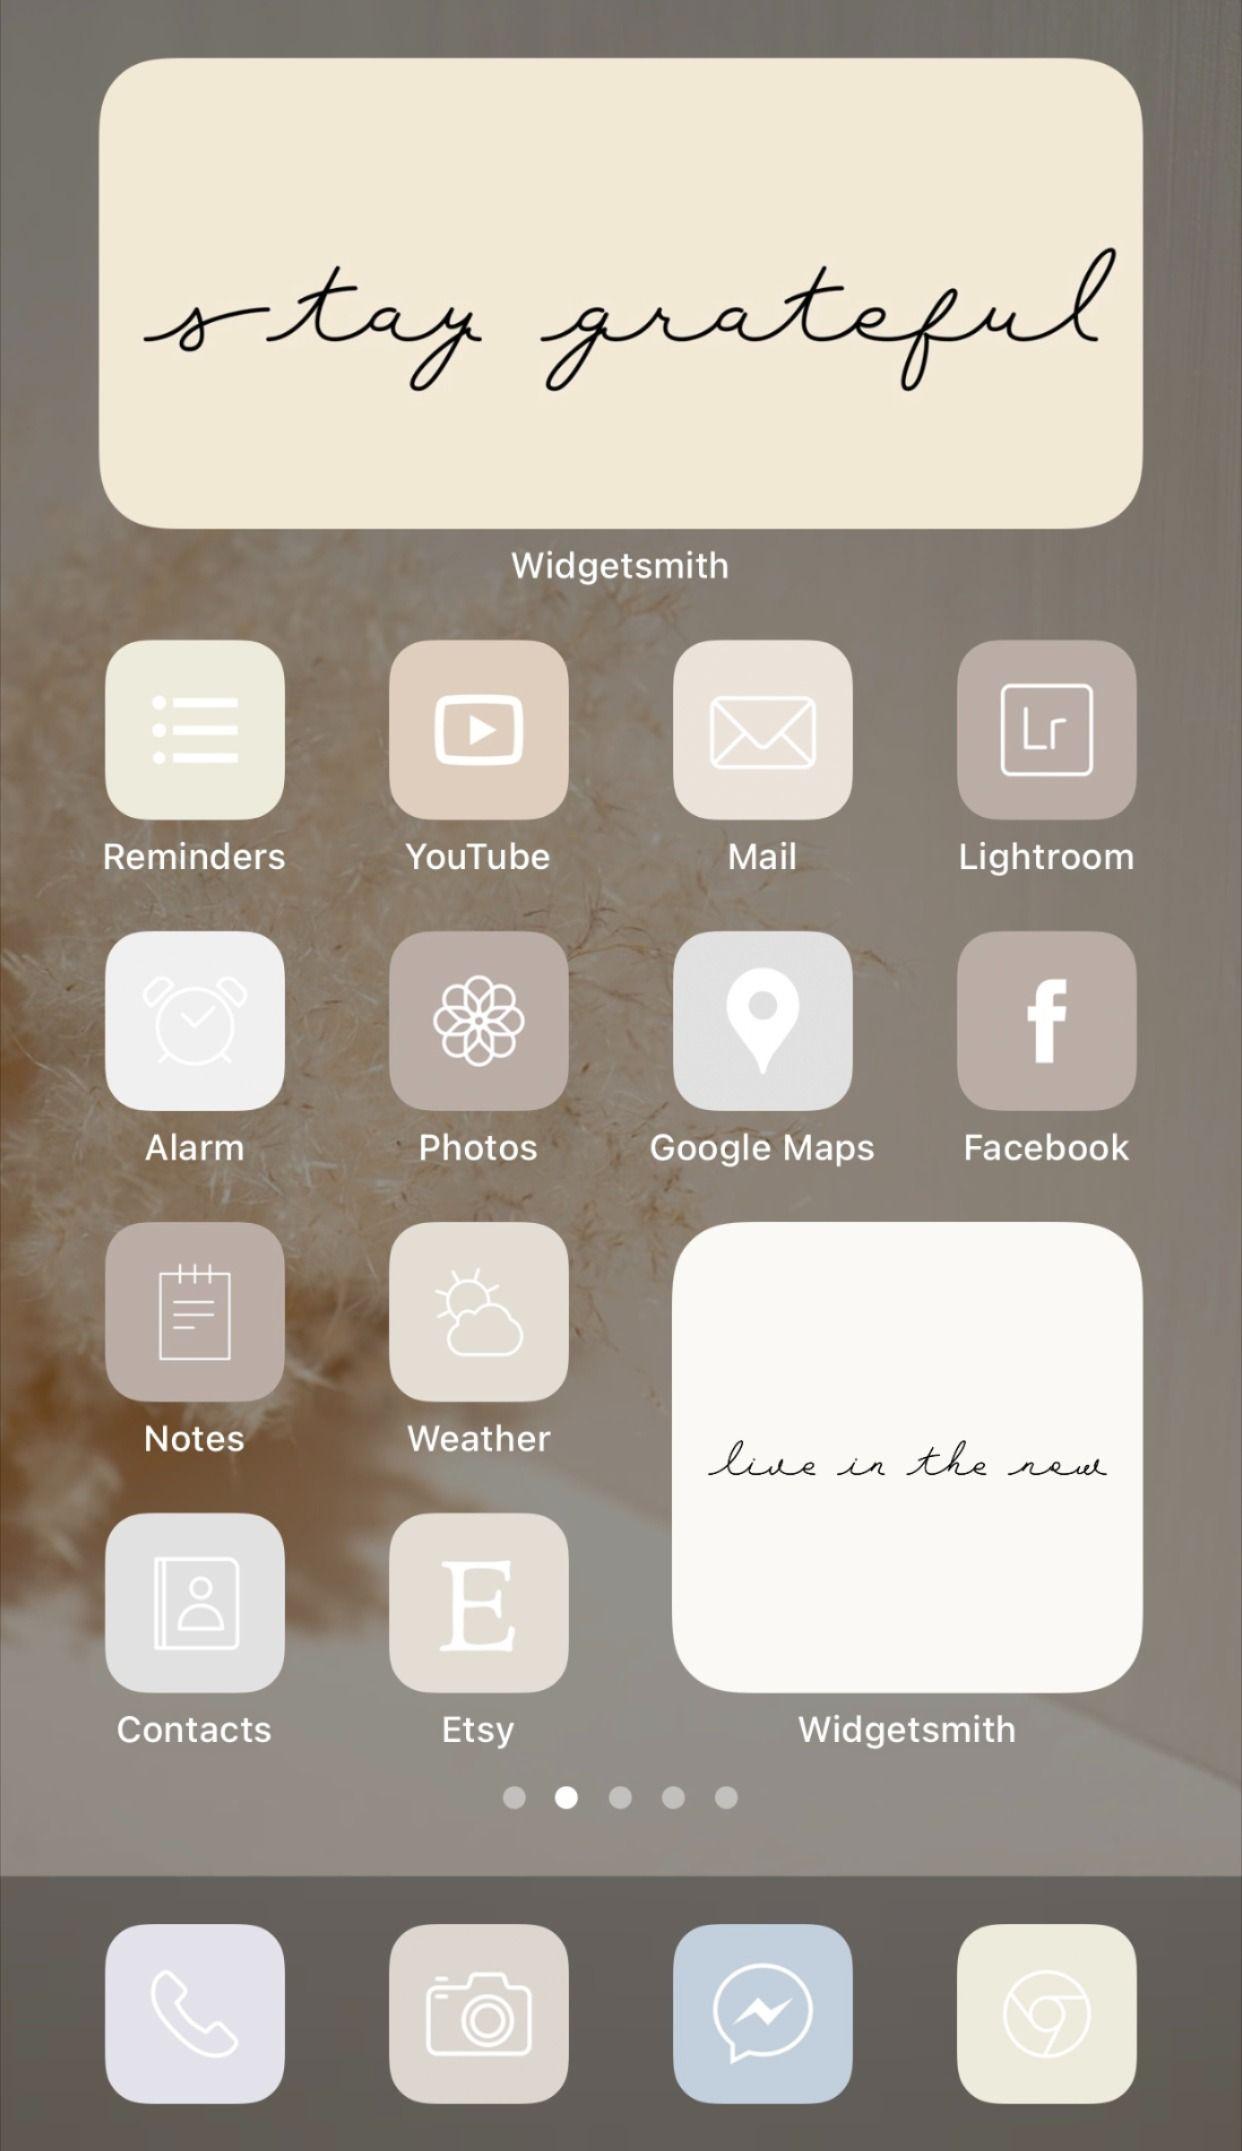 Beige Cream White Aesthetic Iphone App Icon Home Screen Ideas Inspo Inspiration App Covers App Icons In 2020 Inspiration App App Icon App Covers